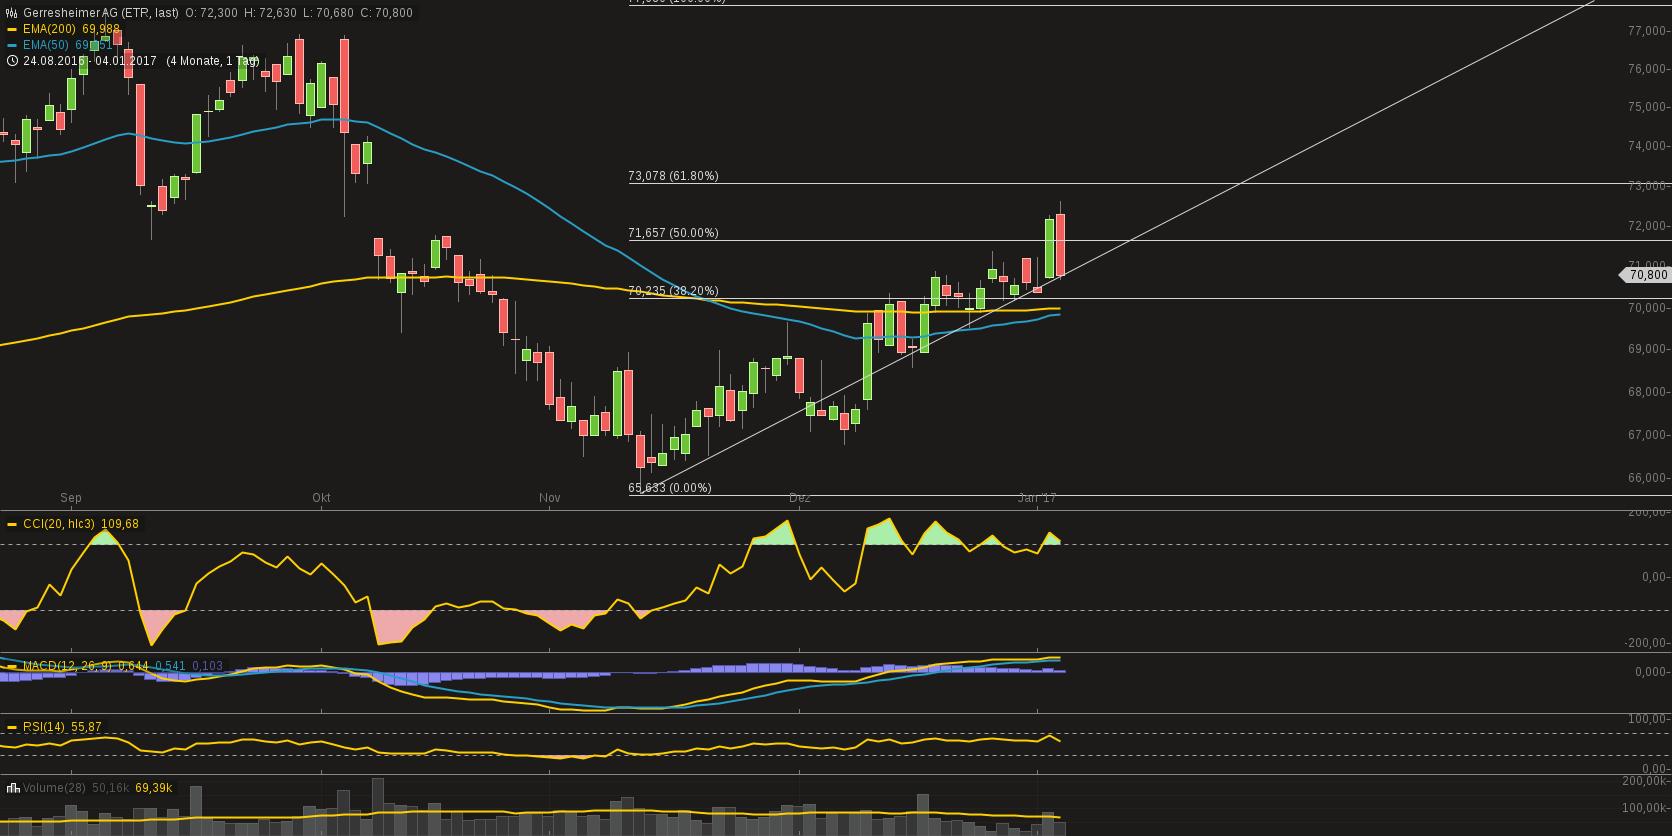 chart-04012017-1702-gerresheimerag.png